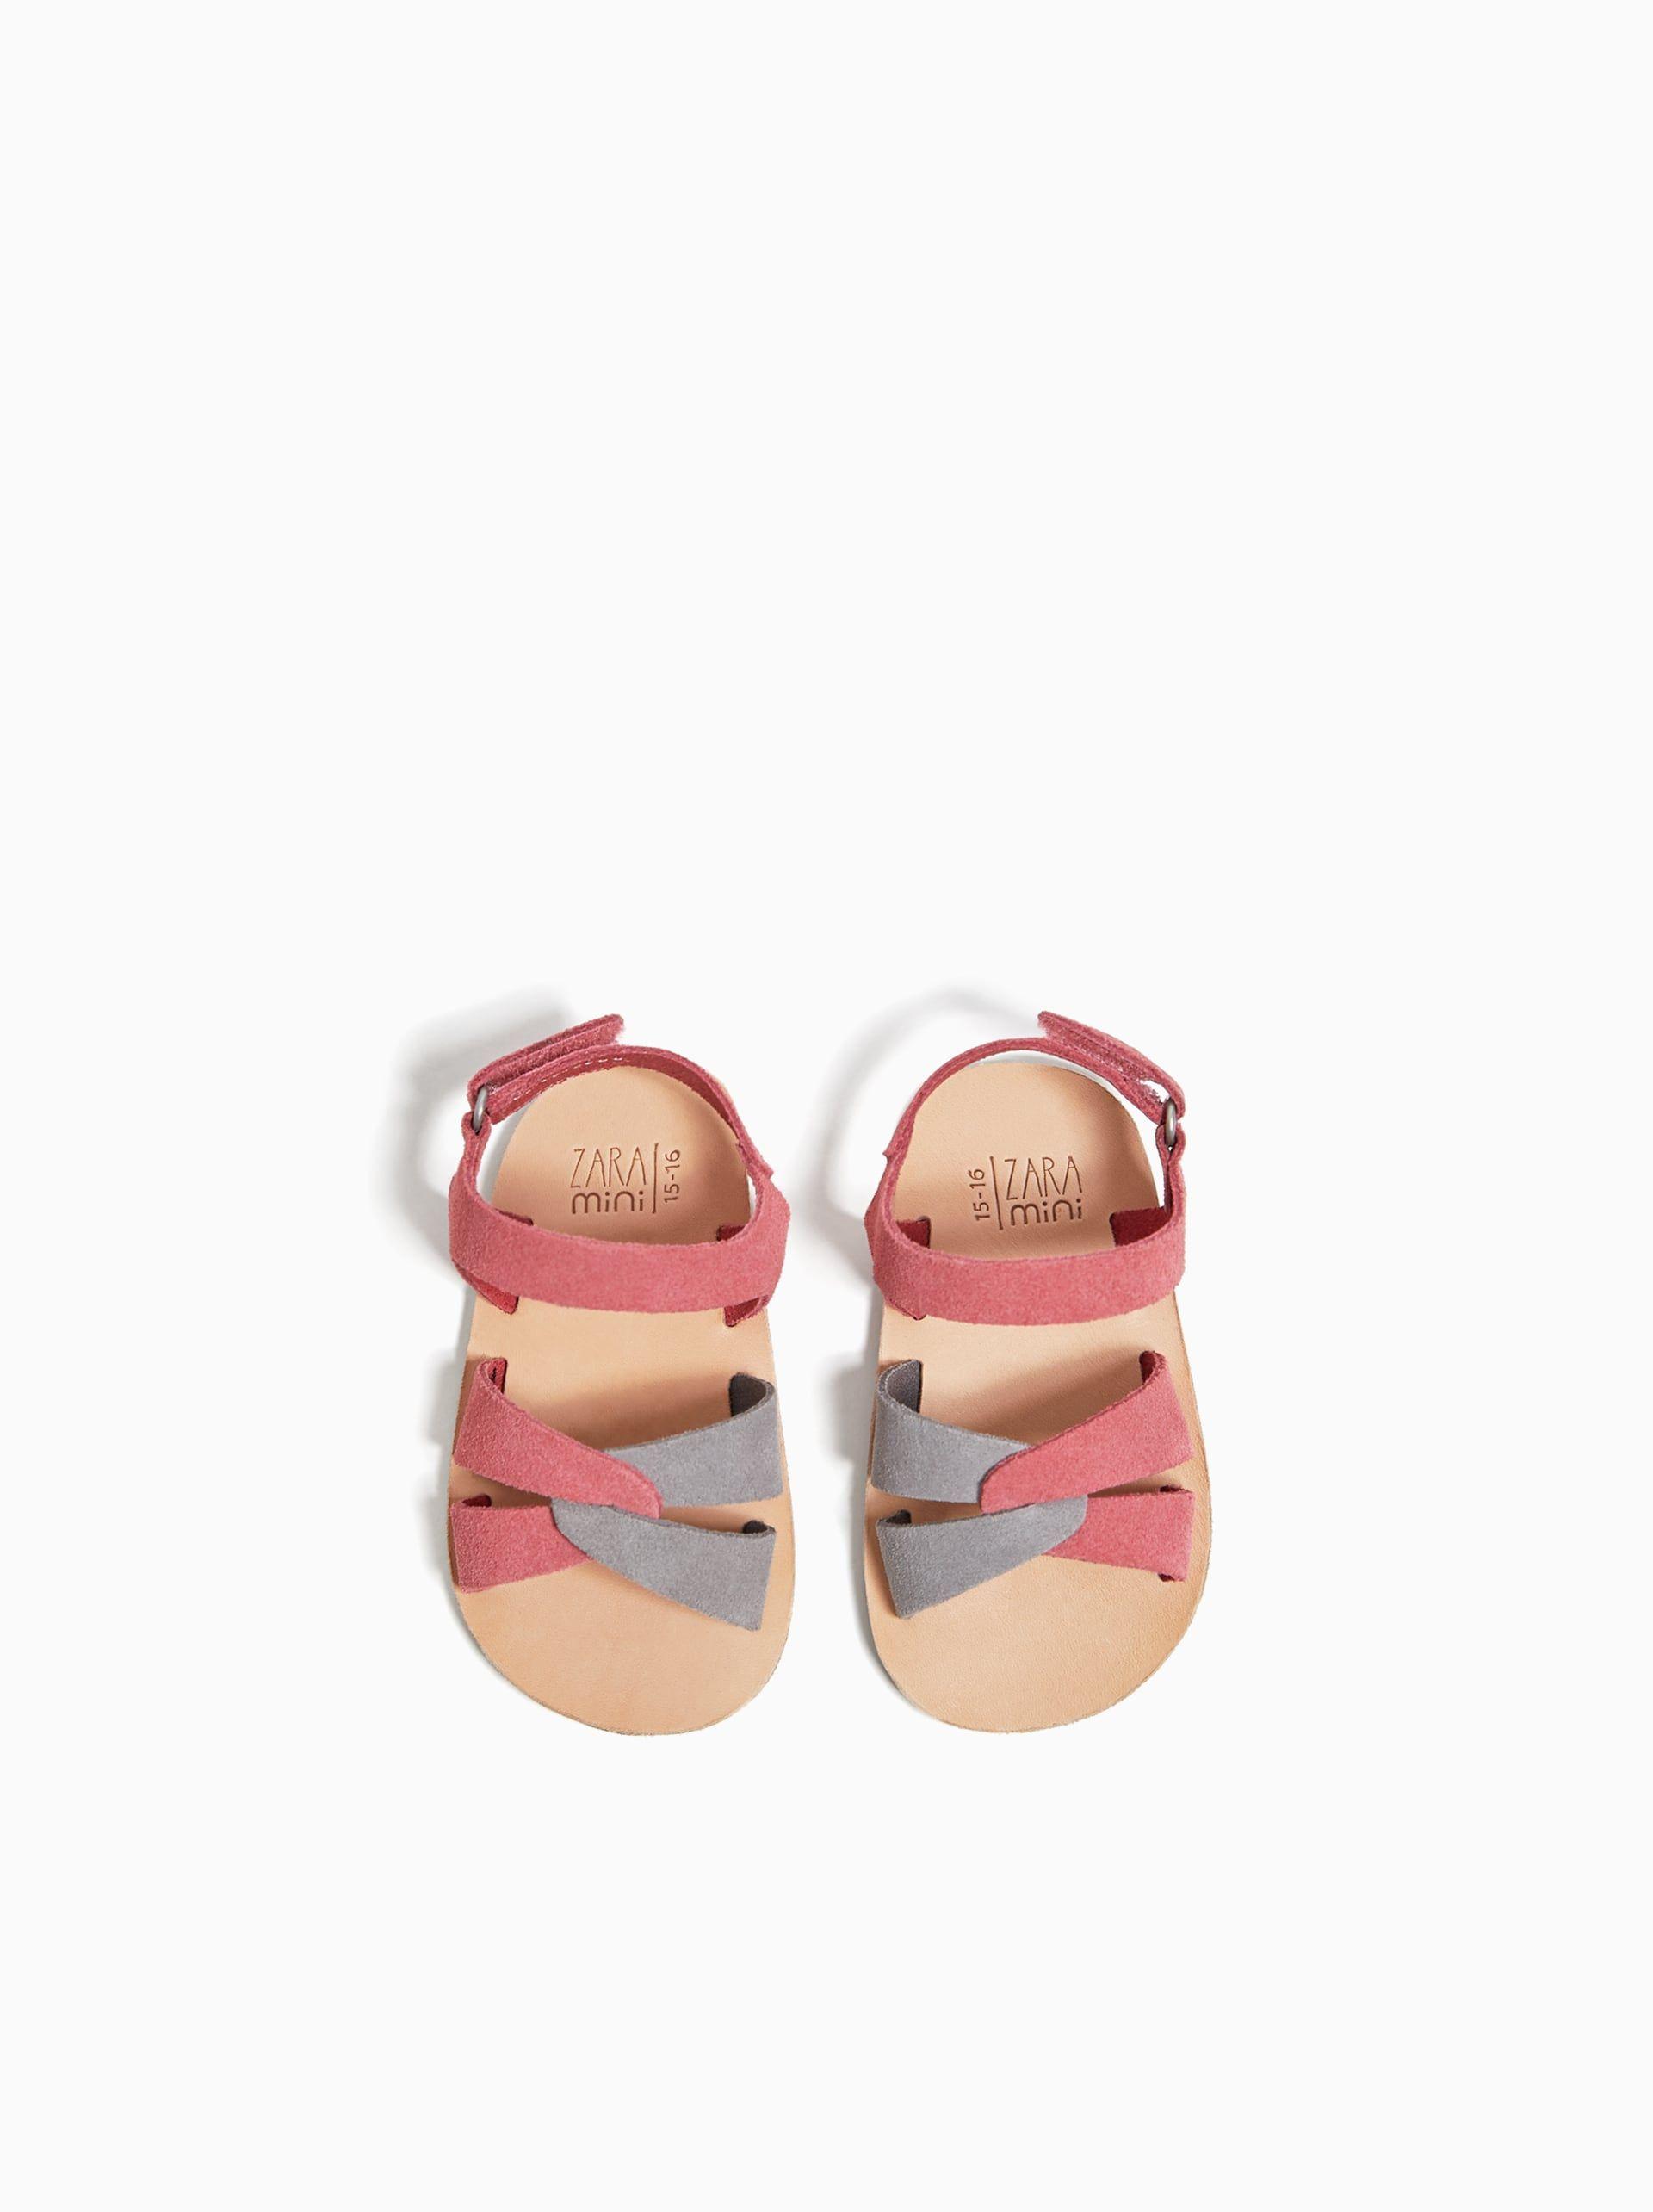 Sandalia Piel última Semana Mini 0 12 Meses Niños Zara España Baby Girl Sandals Cute Baby Shoes Kid Shoes